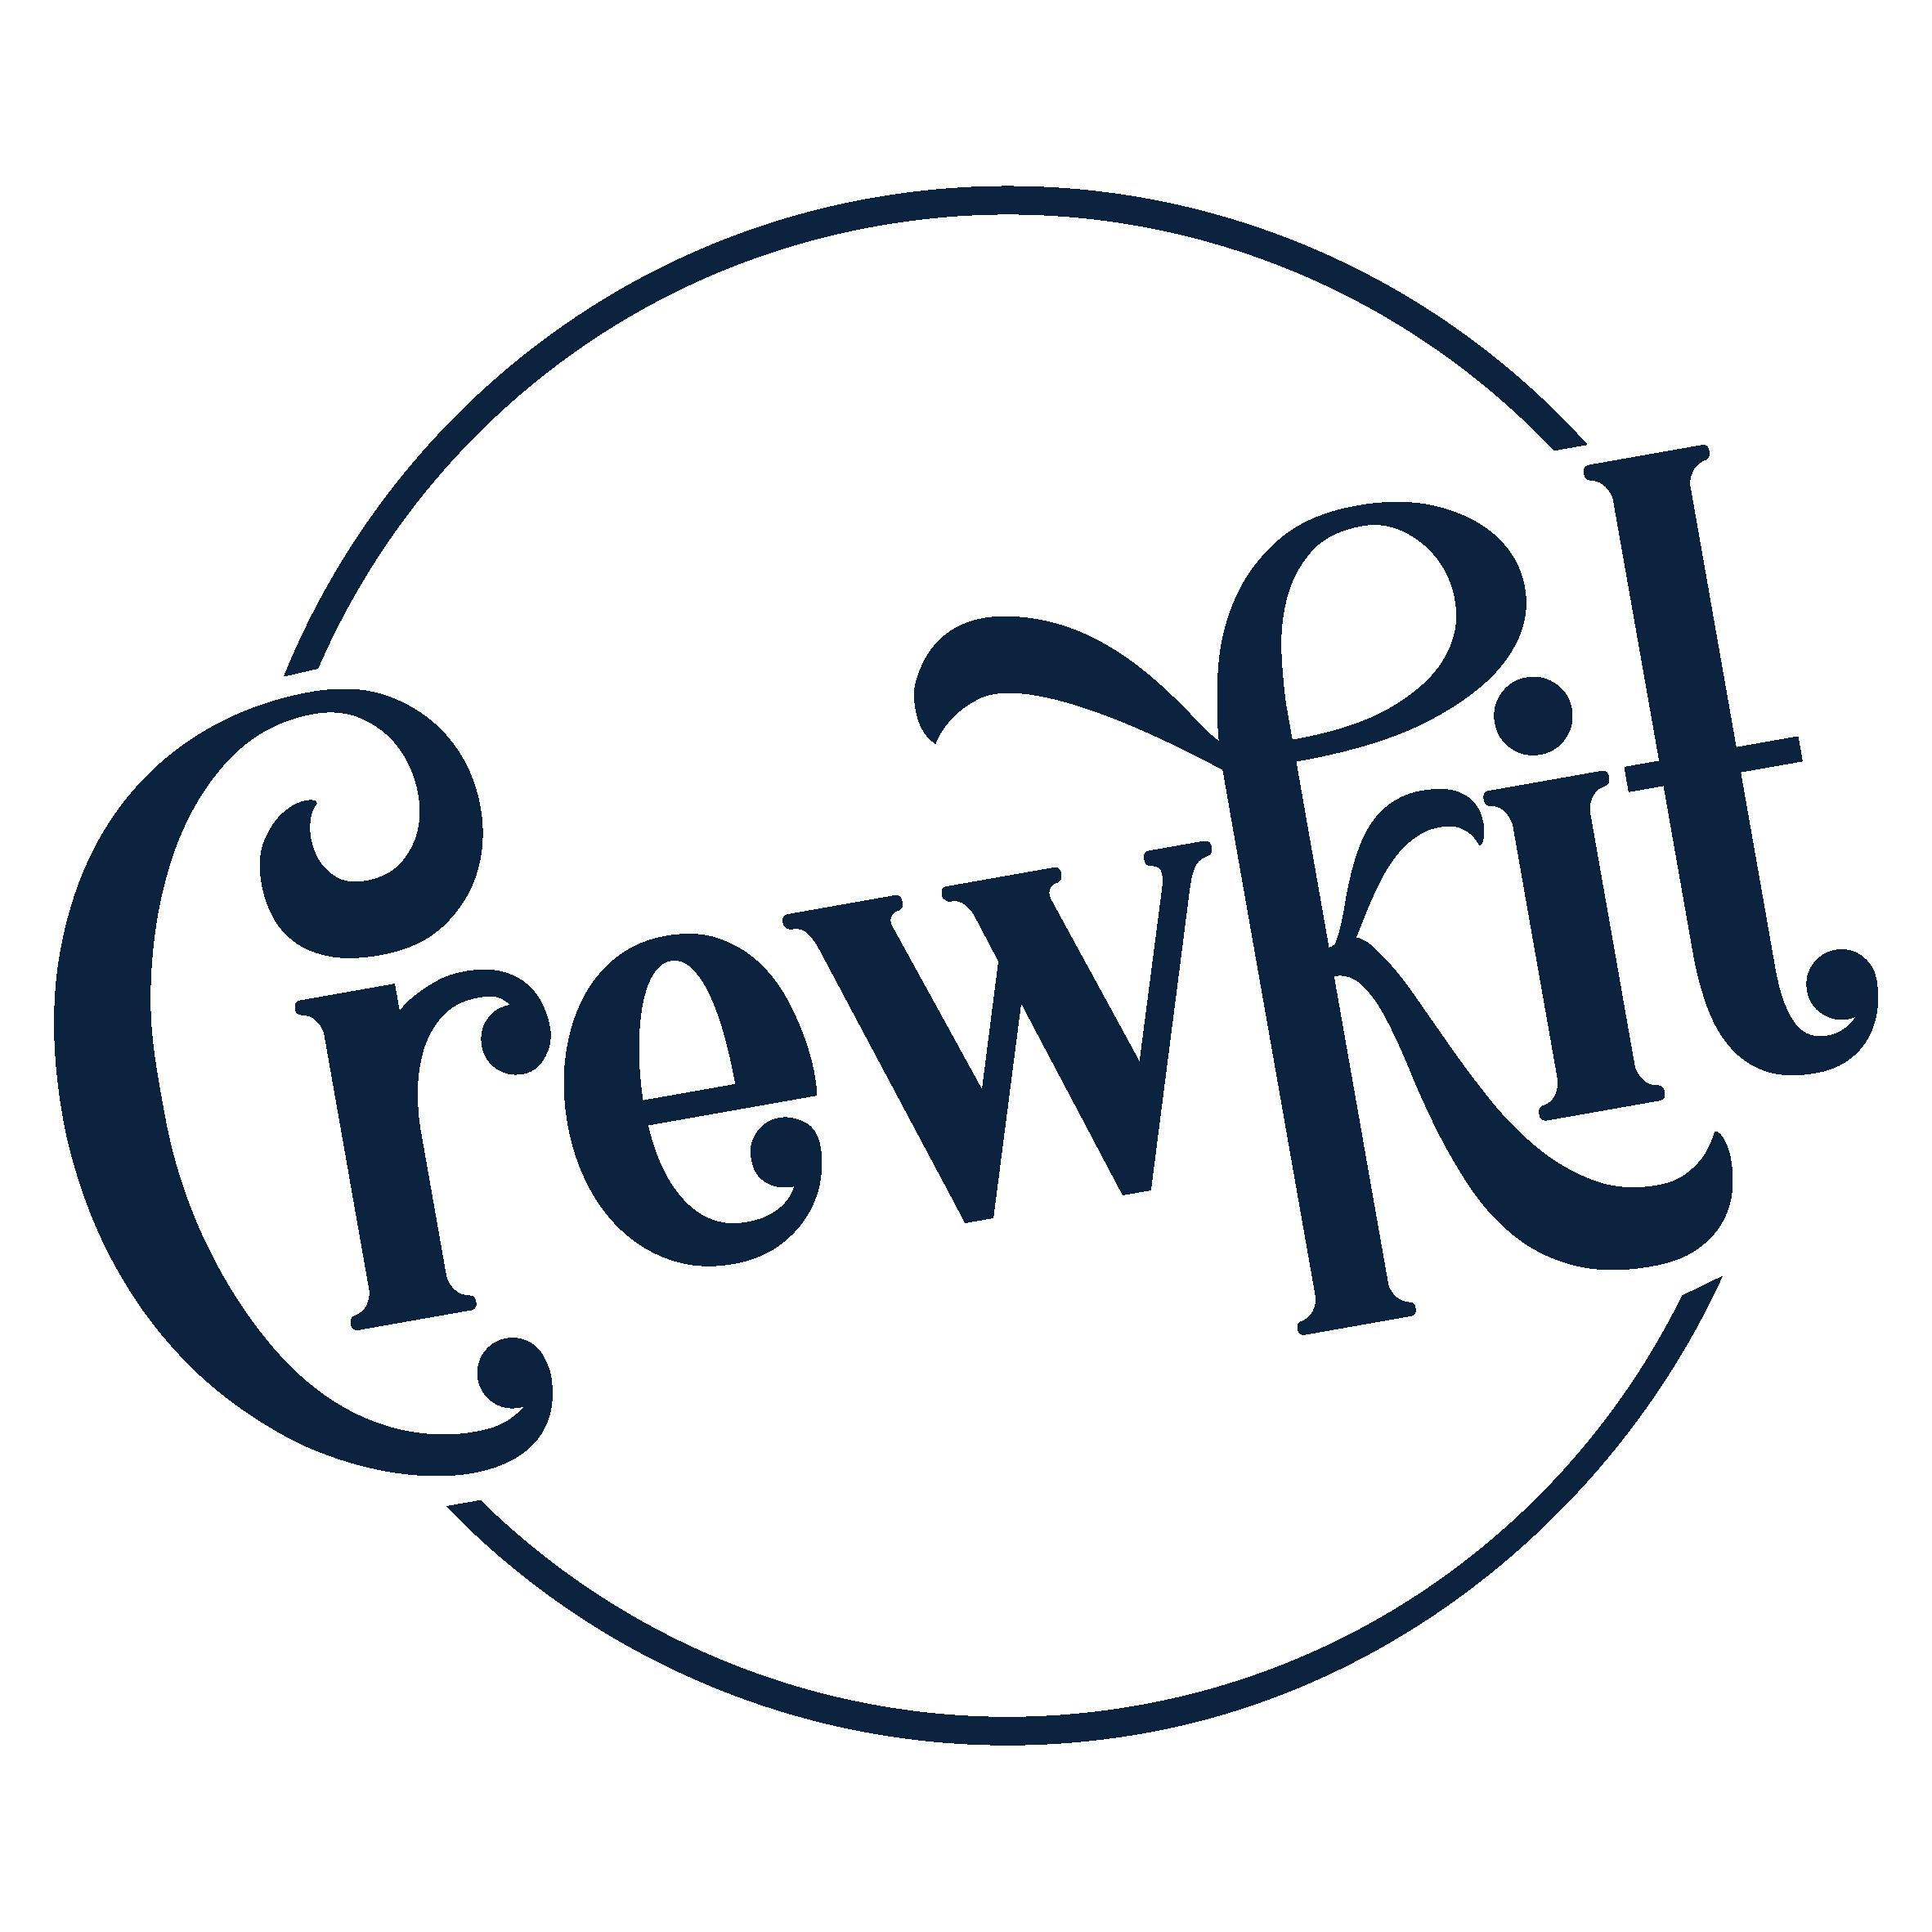 CrewKit